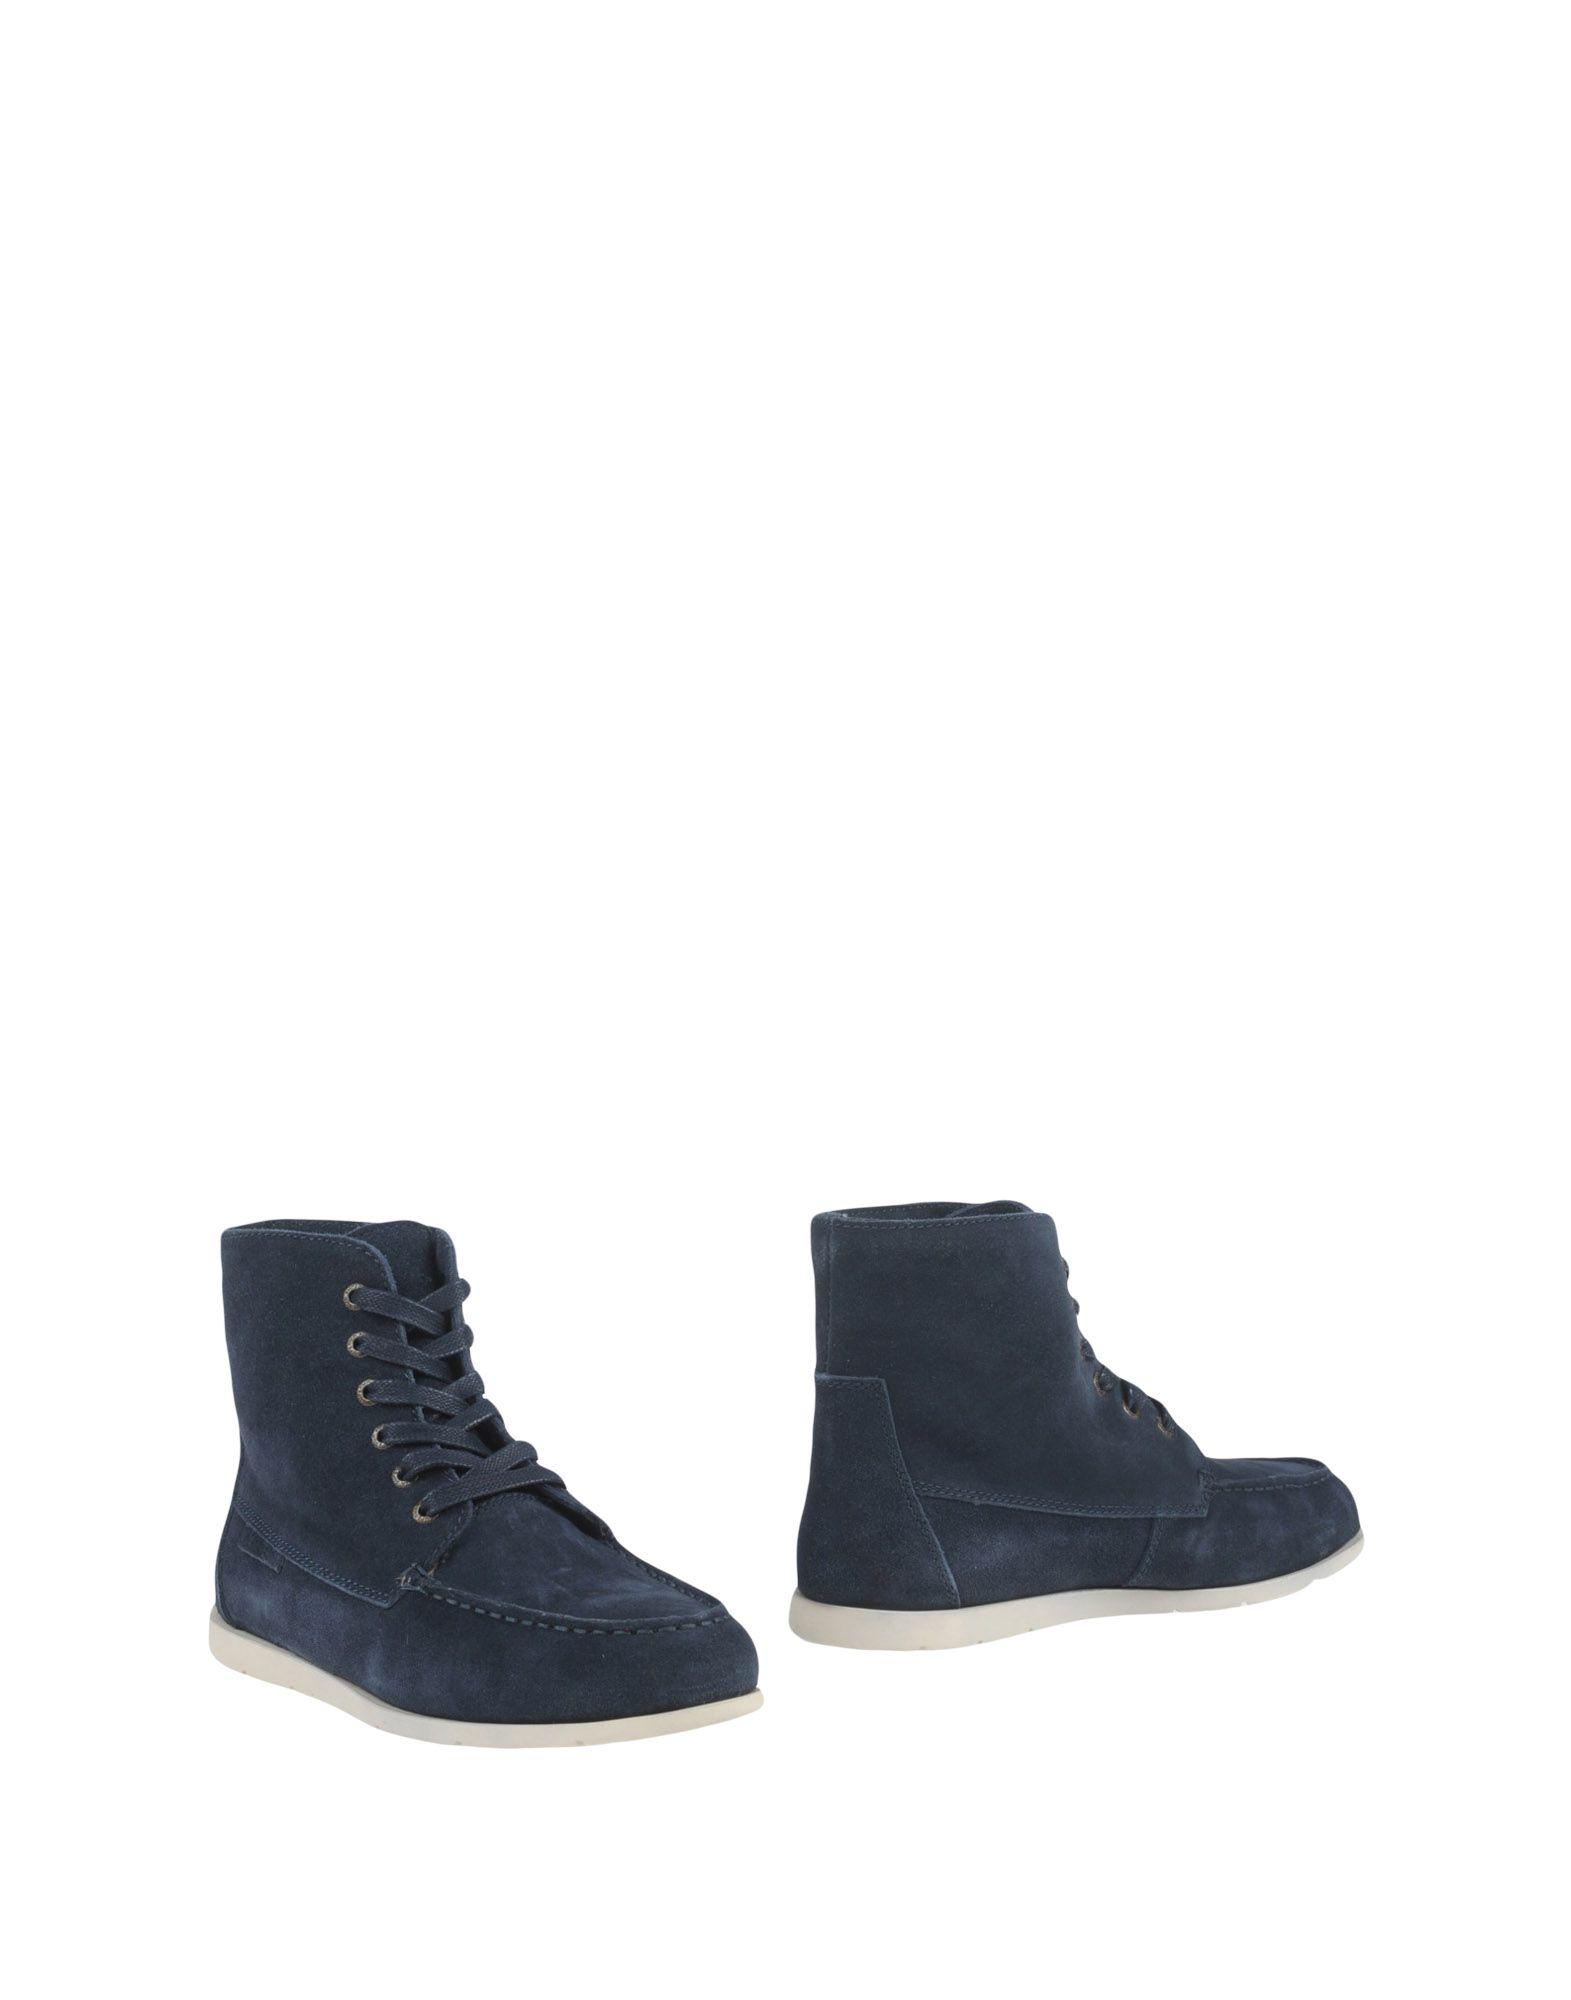 Azul oscuro Botín Superga® Hombre Hombre Hombre - Botines Superga® Los últimos zapatos de descuento para  hombres  y mujeres fe7d44